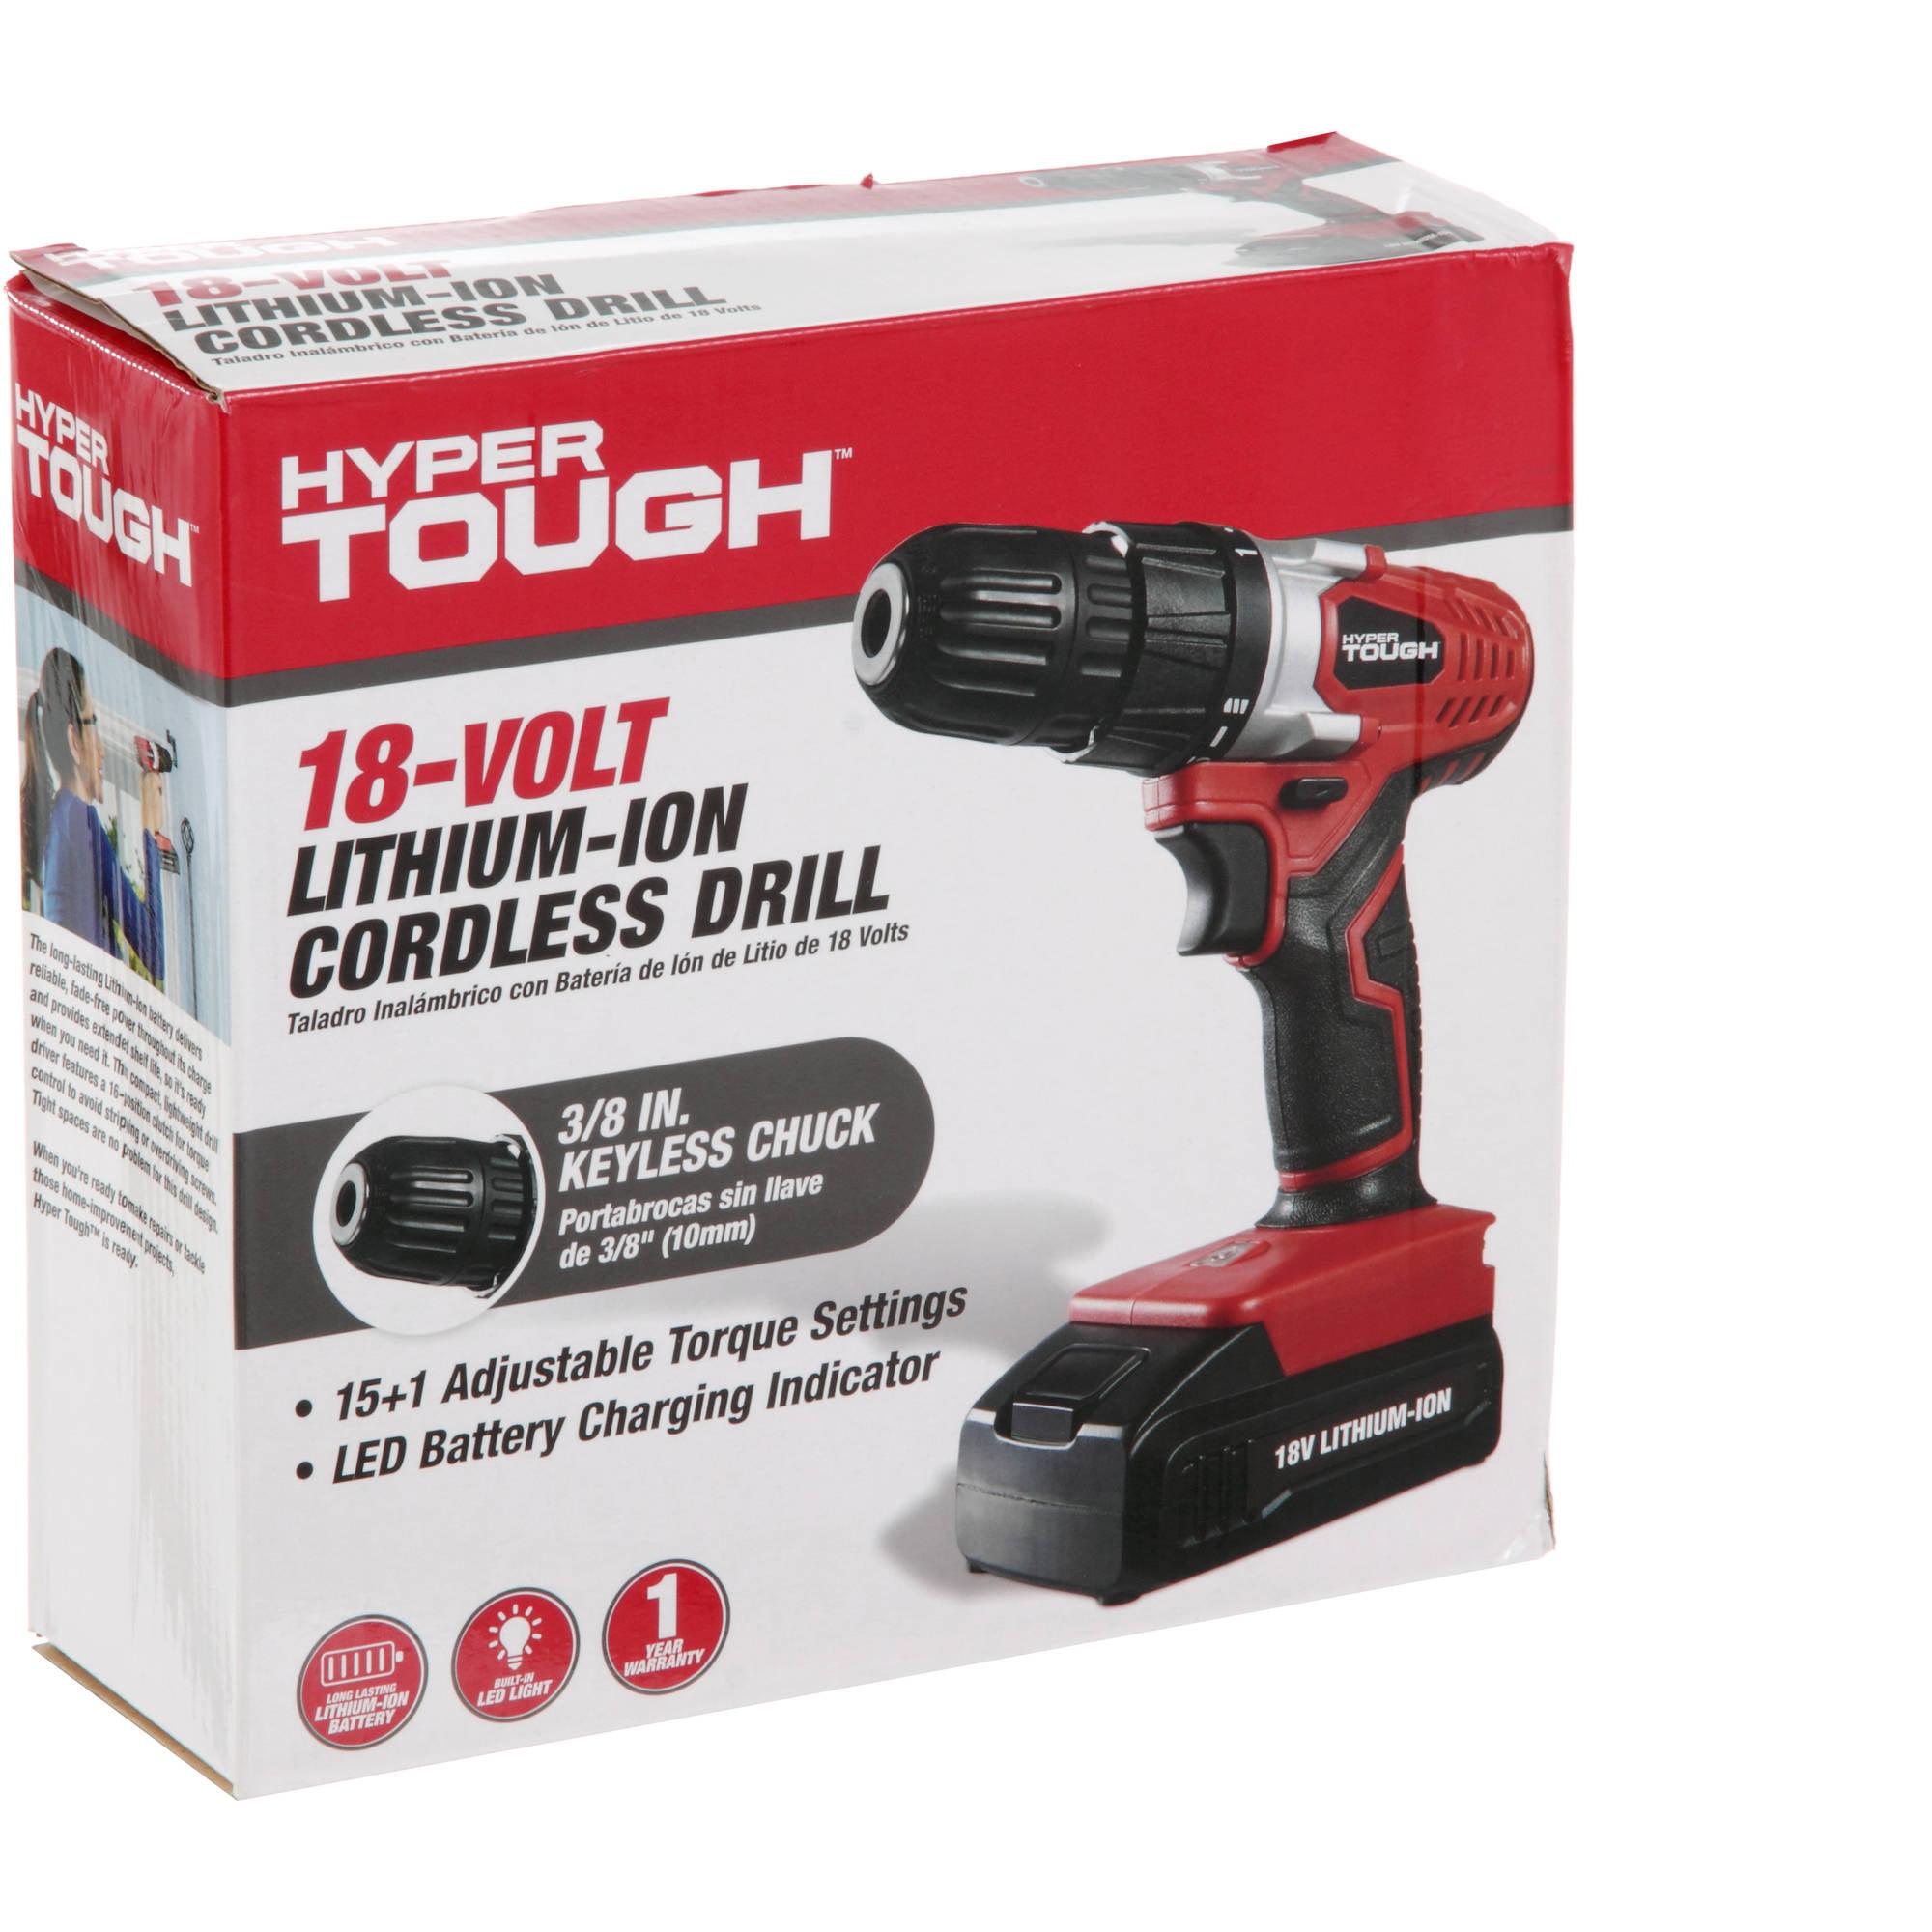 Hyper Tough 18V Lithium-Ion Cordless Drill/Driver - Walmart.com